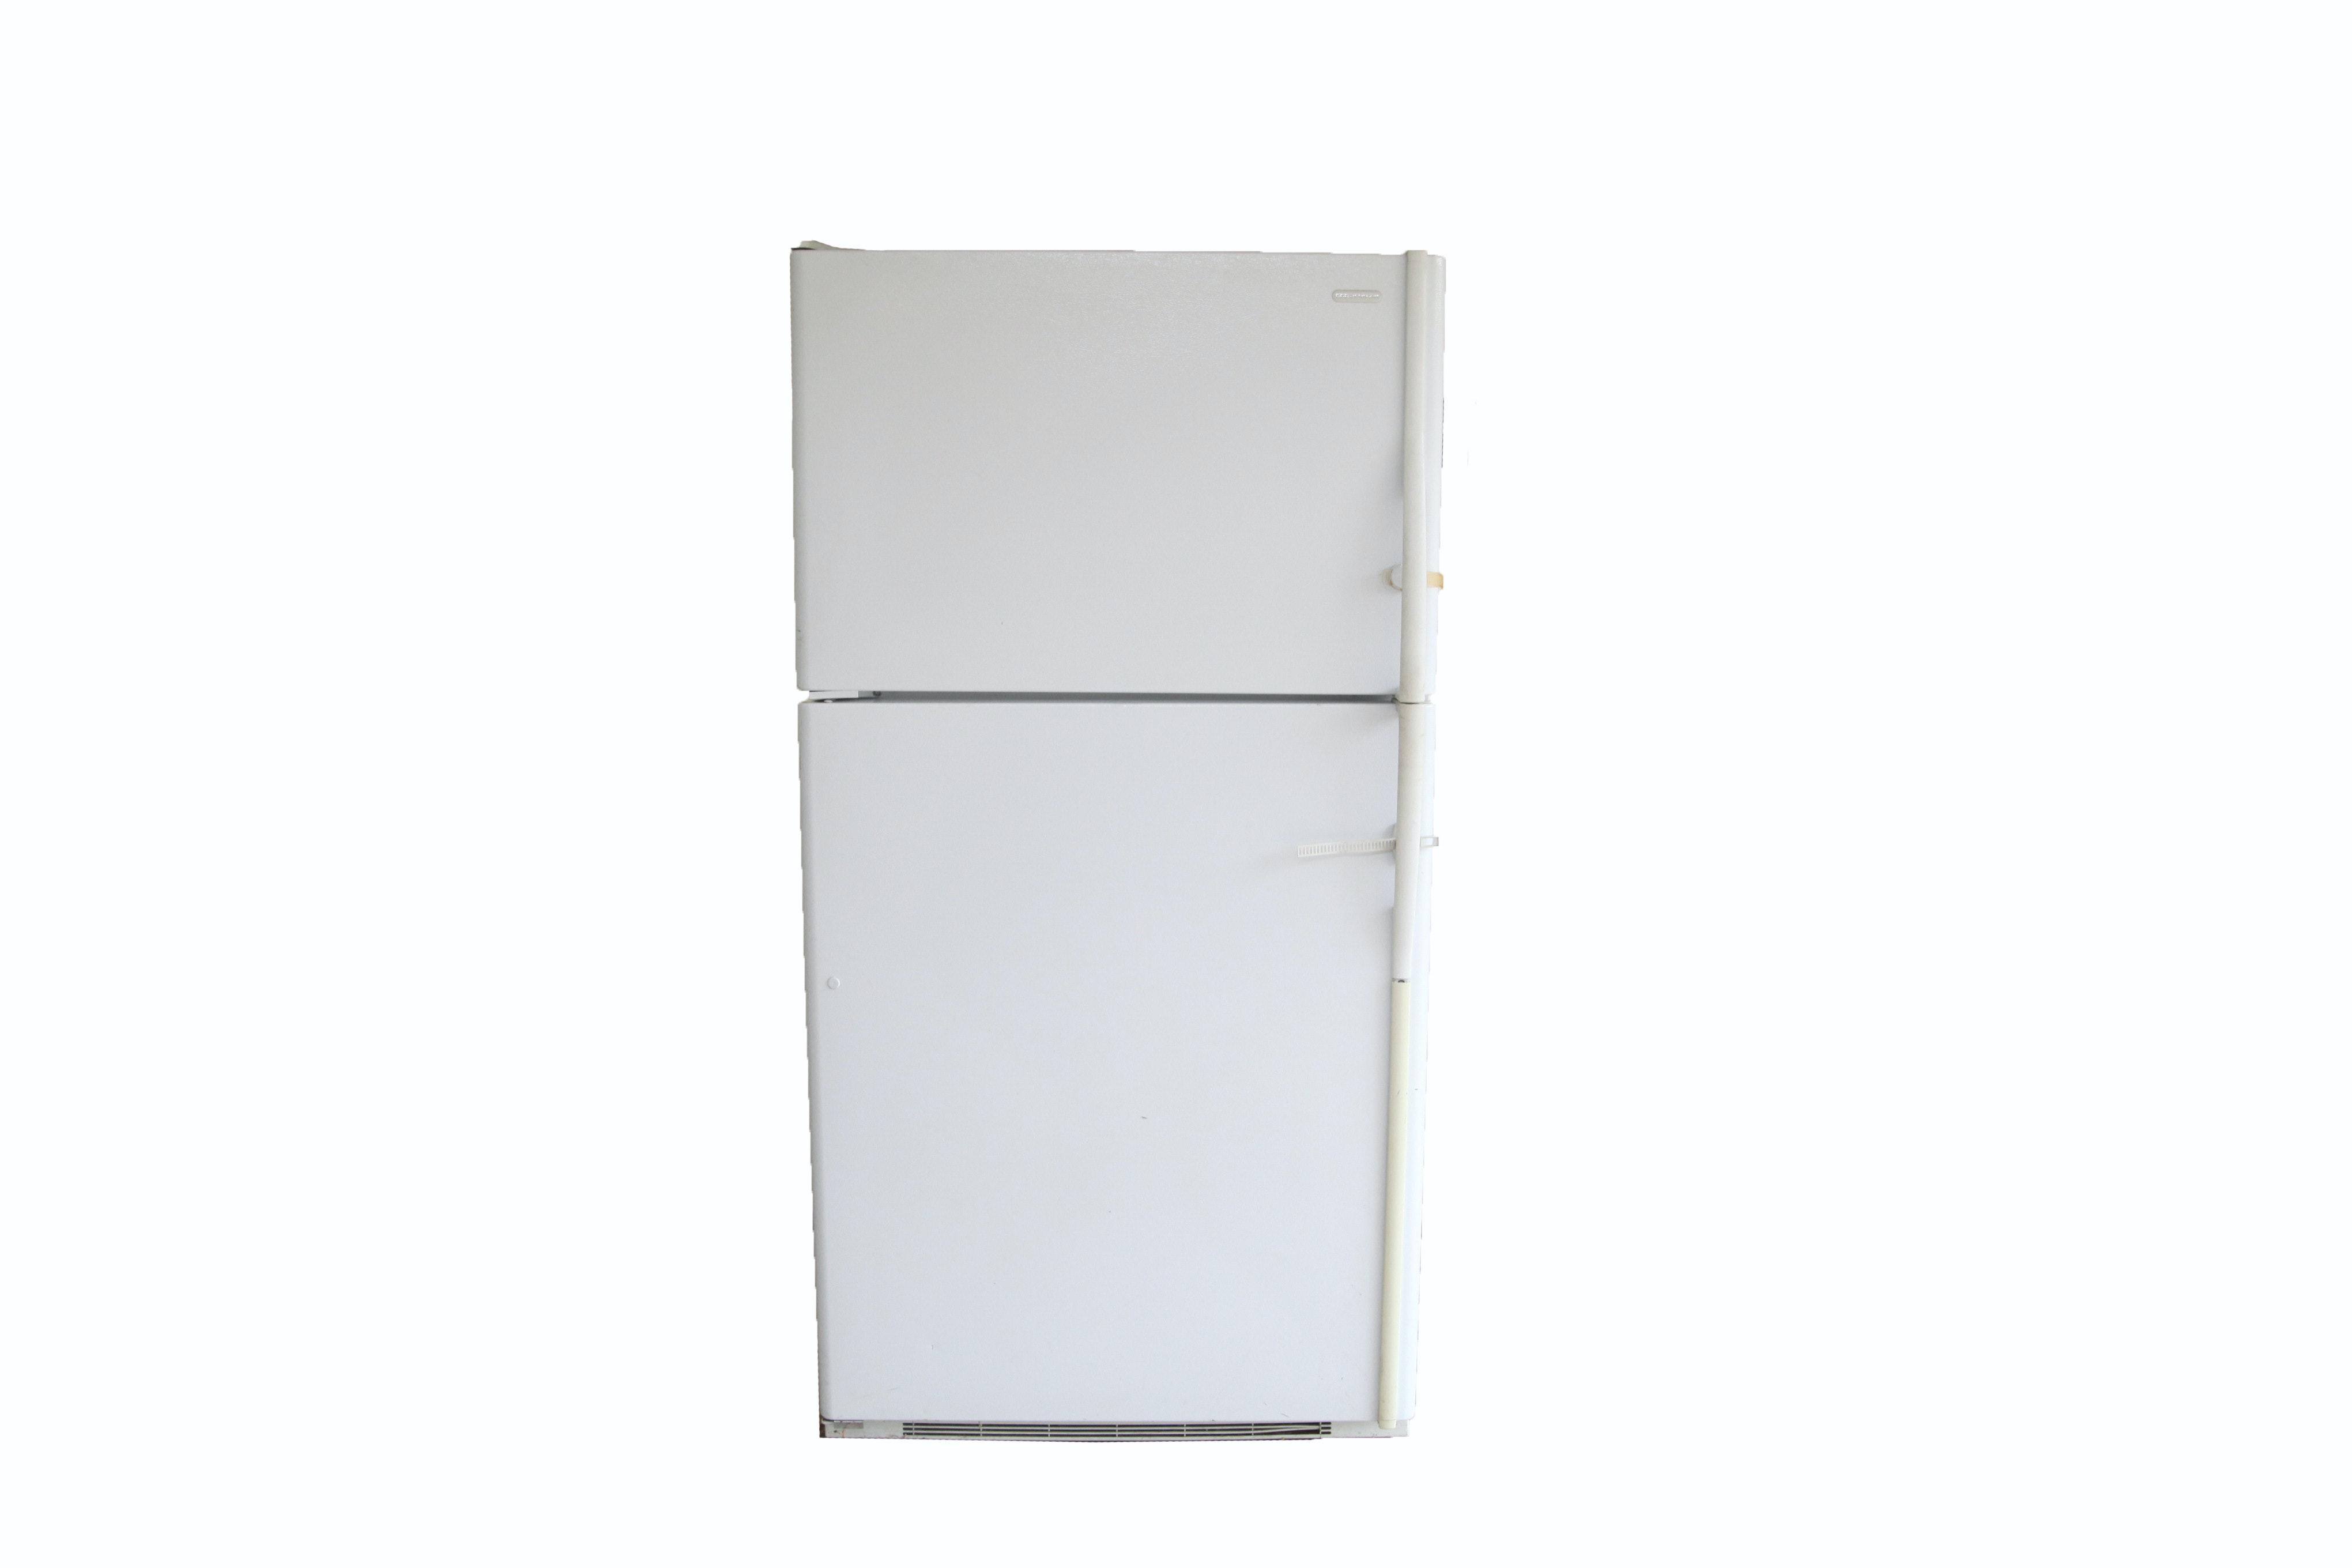 "Jenn-Air ""Twin Fresh"" Refrigerator"